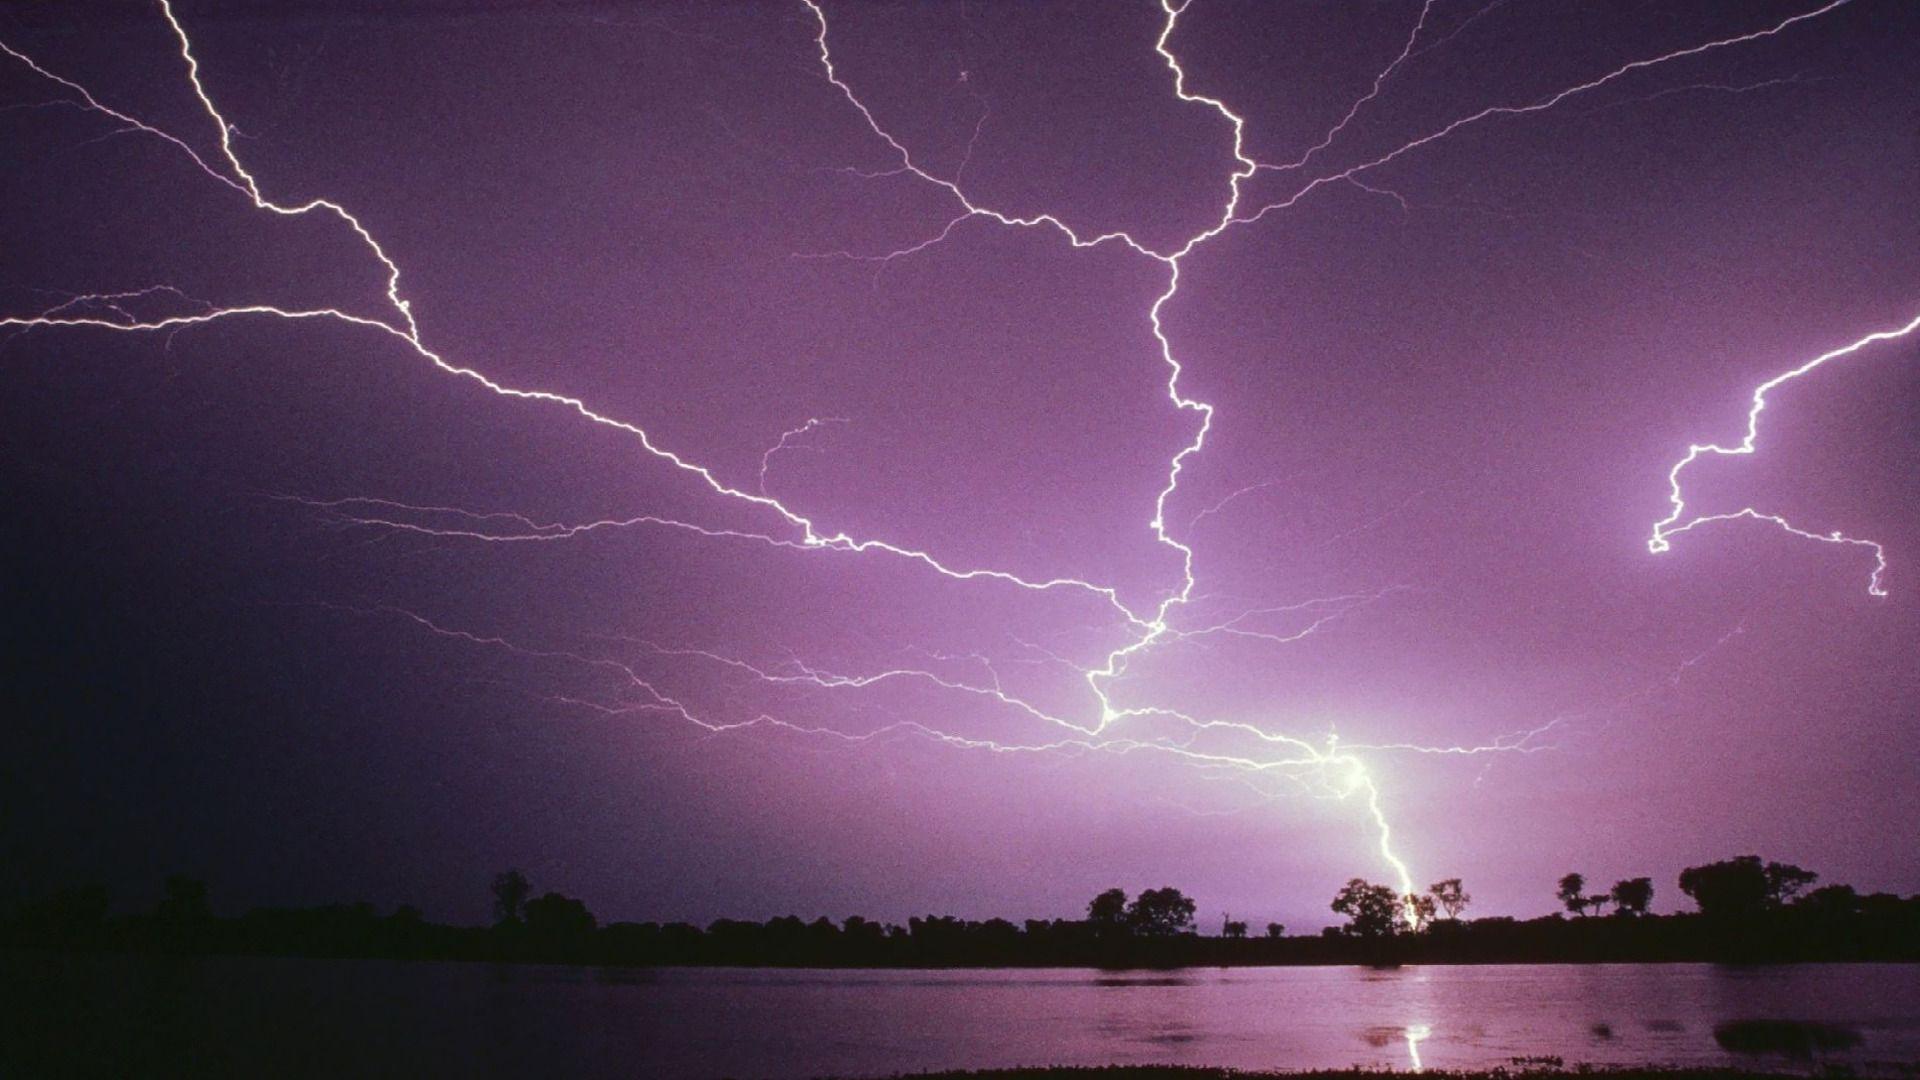 thunder storm wallpaper | endroits à visiter | pinterest